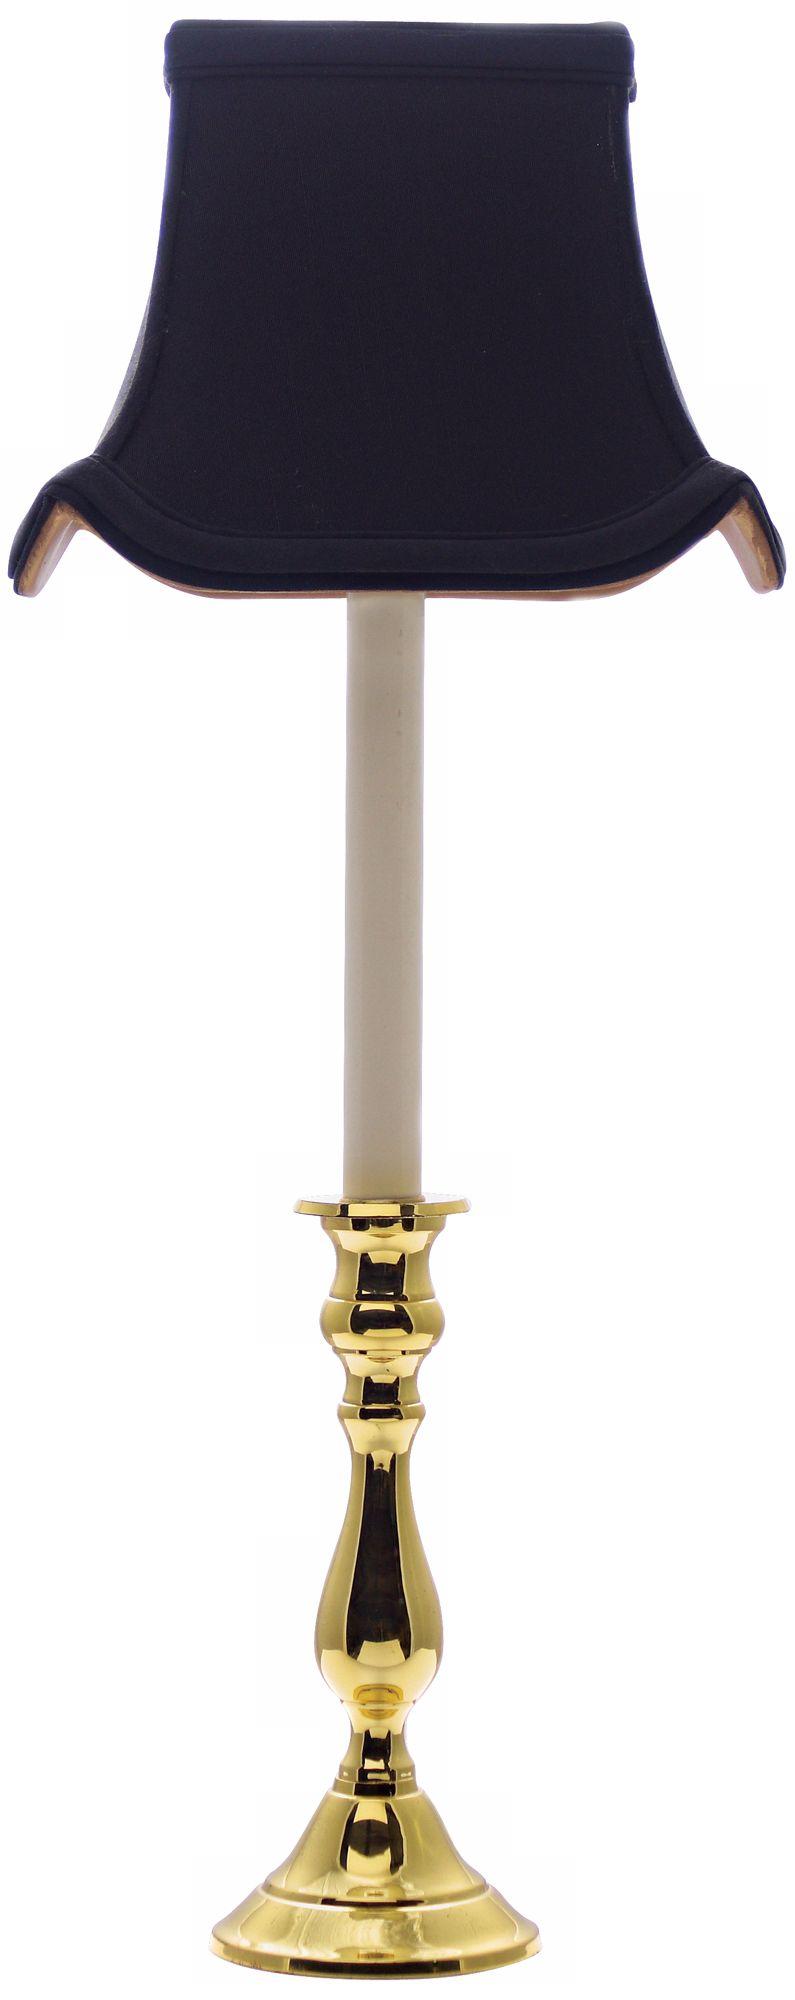 Polished Brass Black Shade Candlestick Buffet Lamp